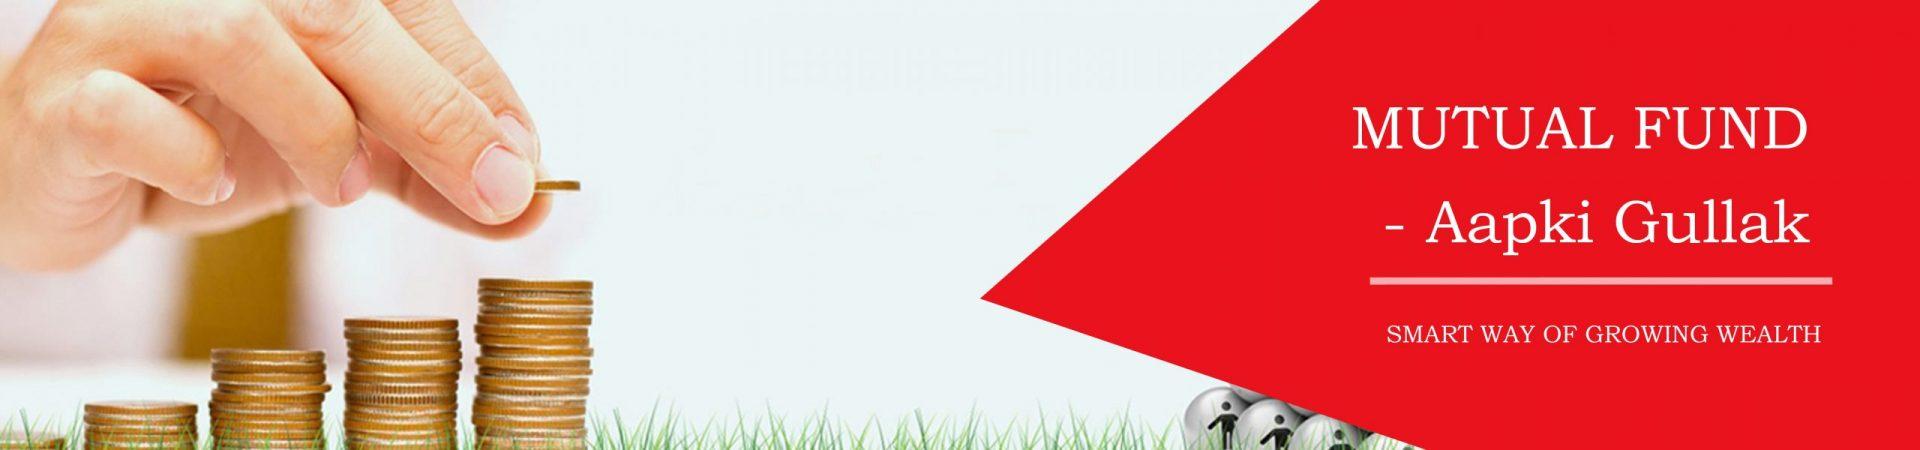 mutual-fund-banner